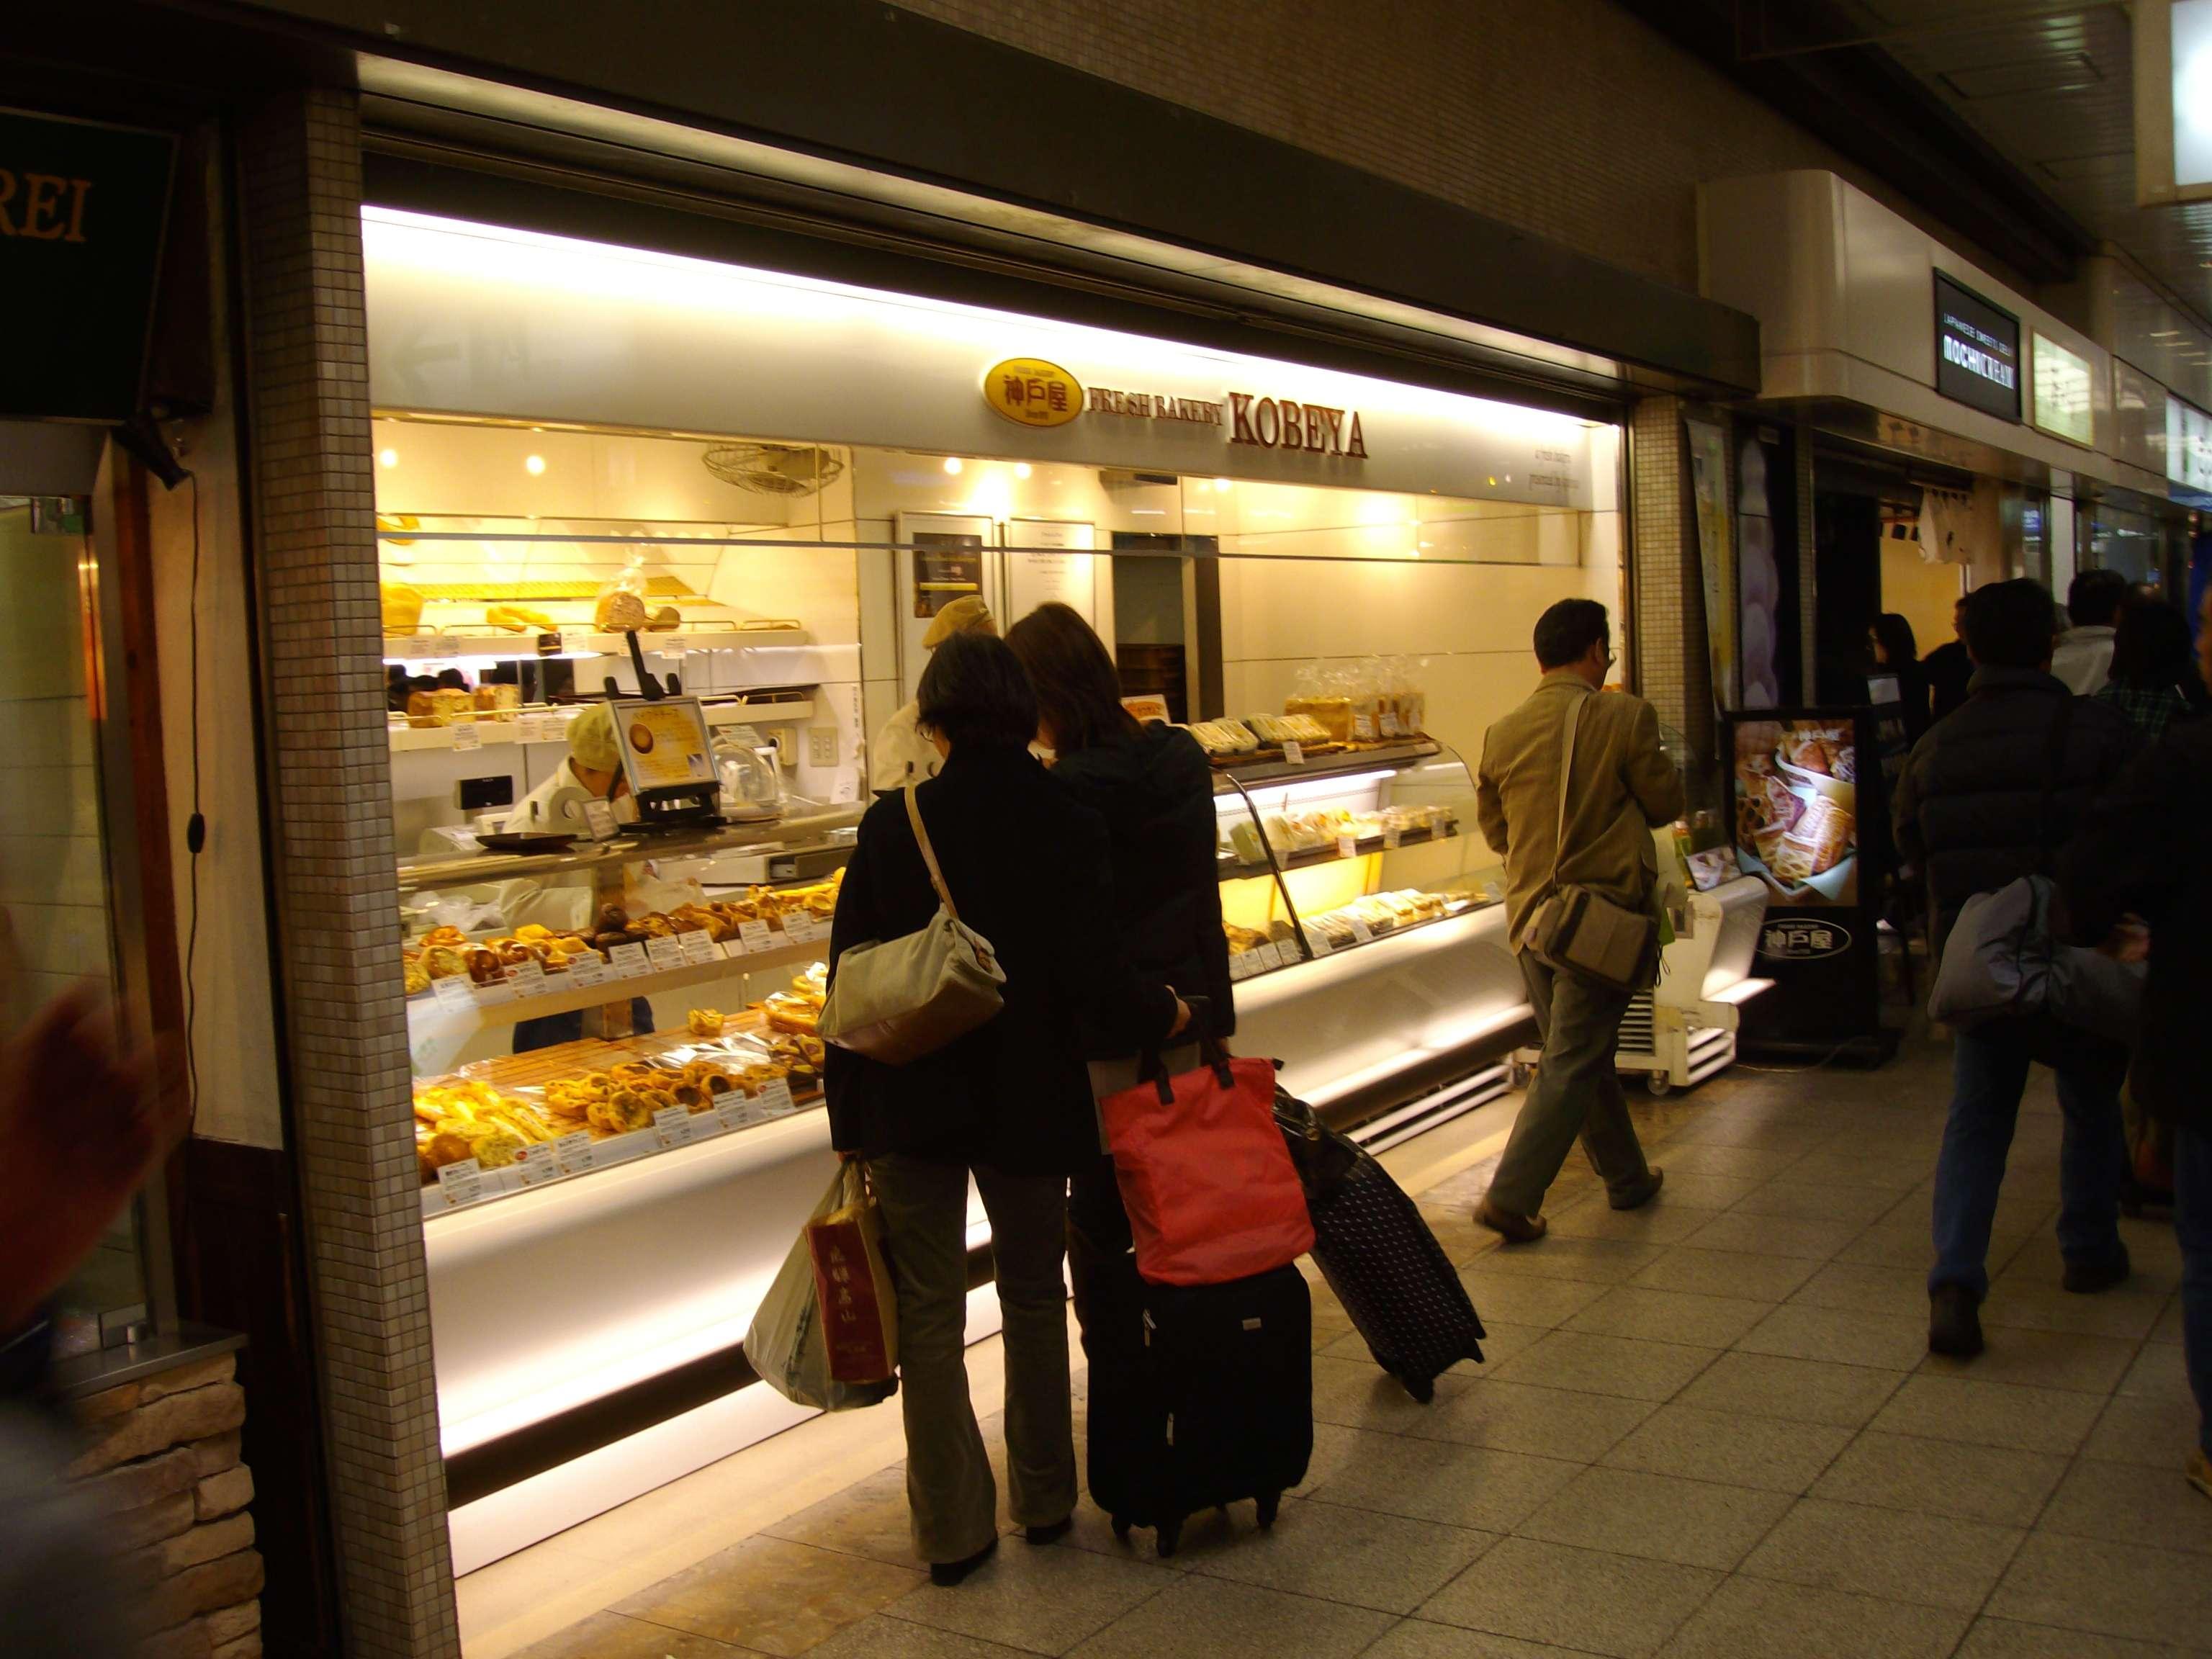 神戸屋キッチン 新大阪駅店